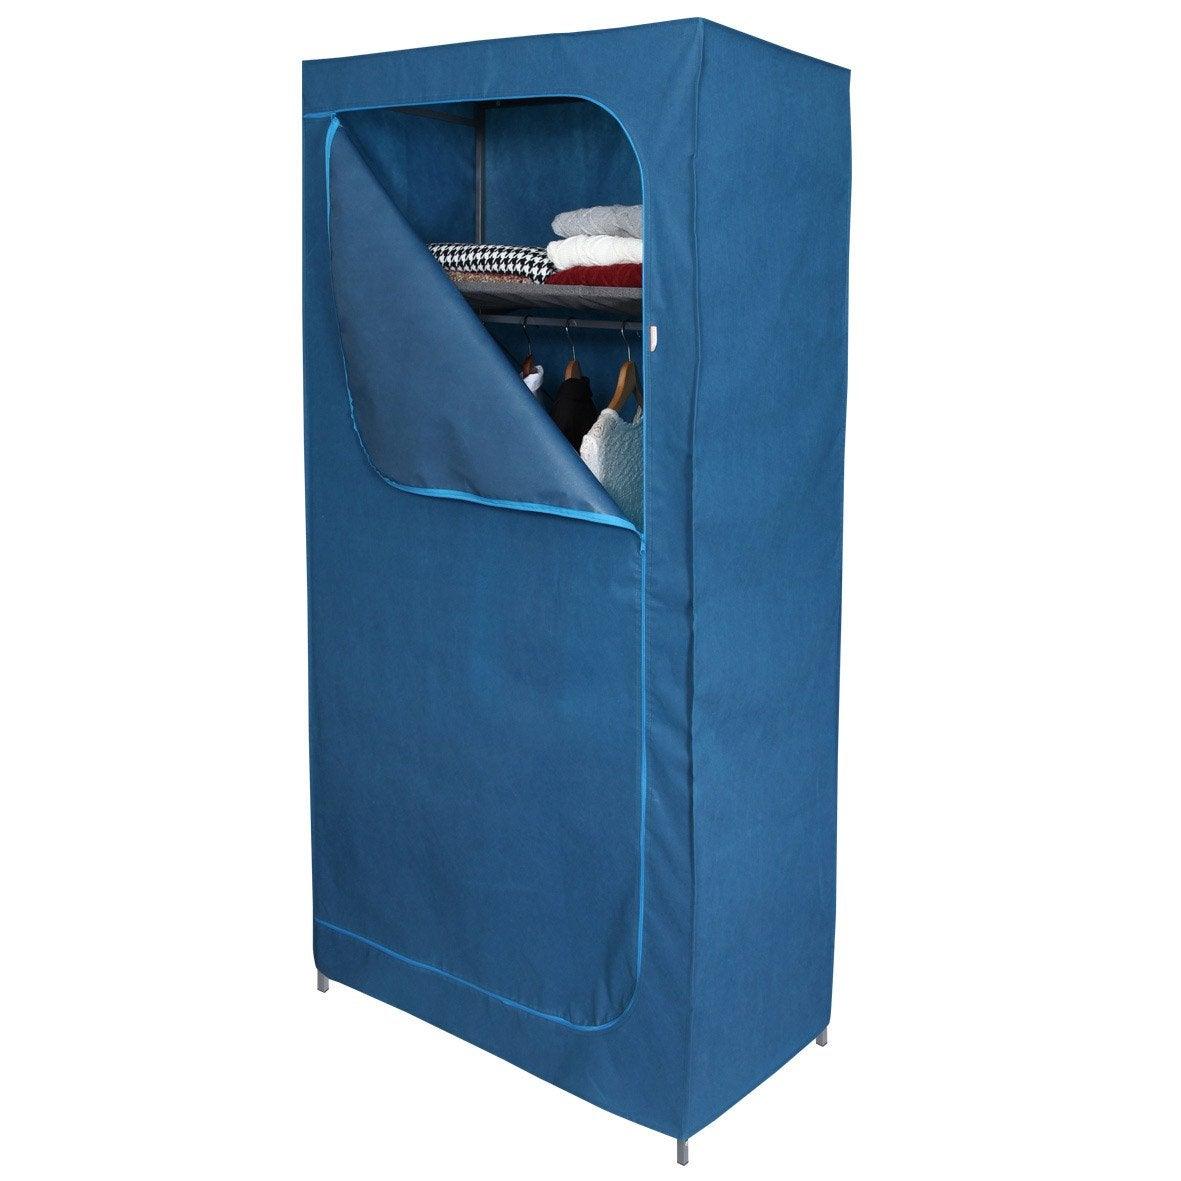 housse pour penderie bleu intiss spaceo x x p. Black Bedroom Furniture Sets. Home Design Ideas